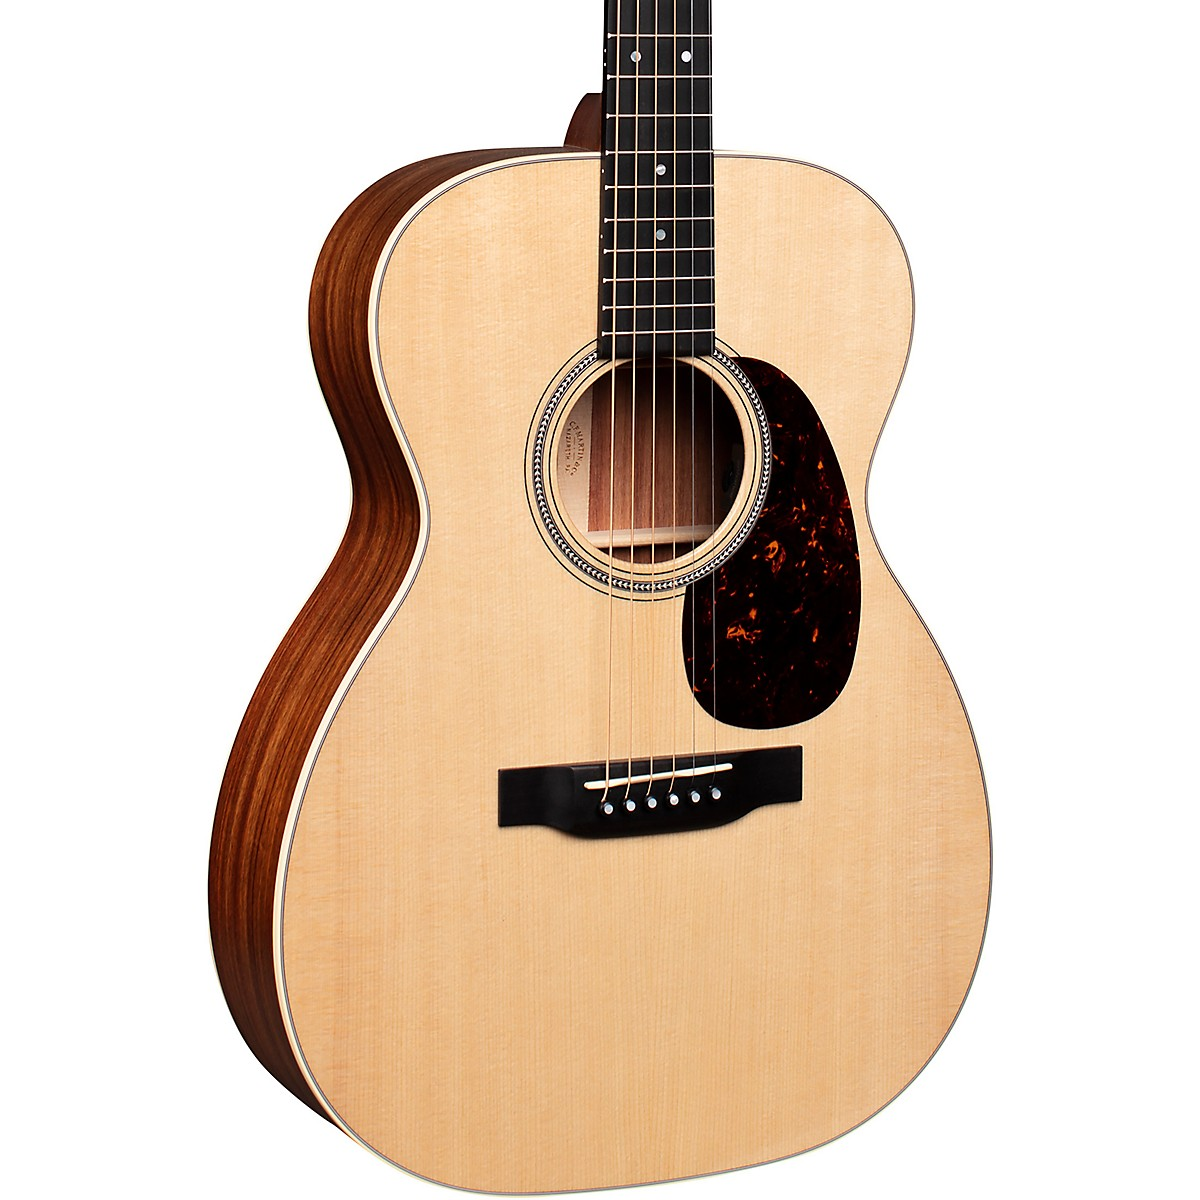 Martin 00-16E 16 Series with Granadillo Parlor Acoustic-Electric Guitar